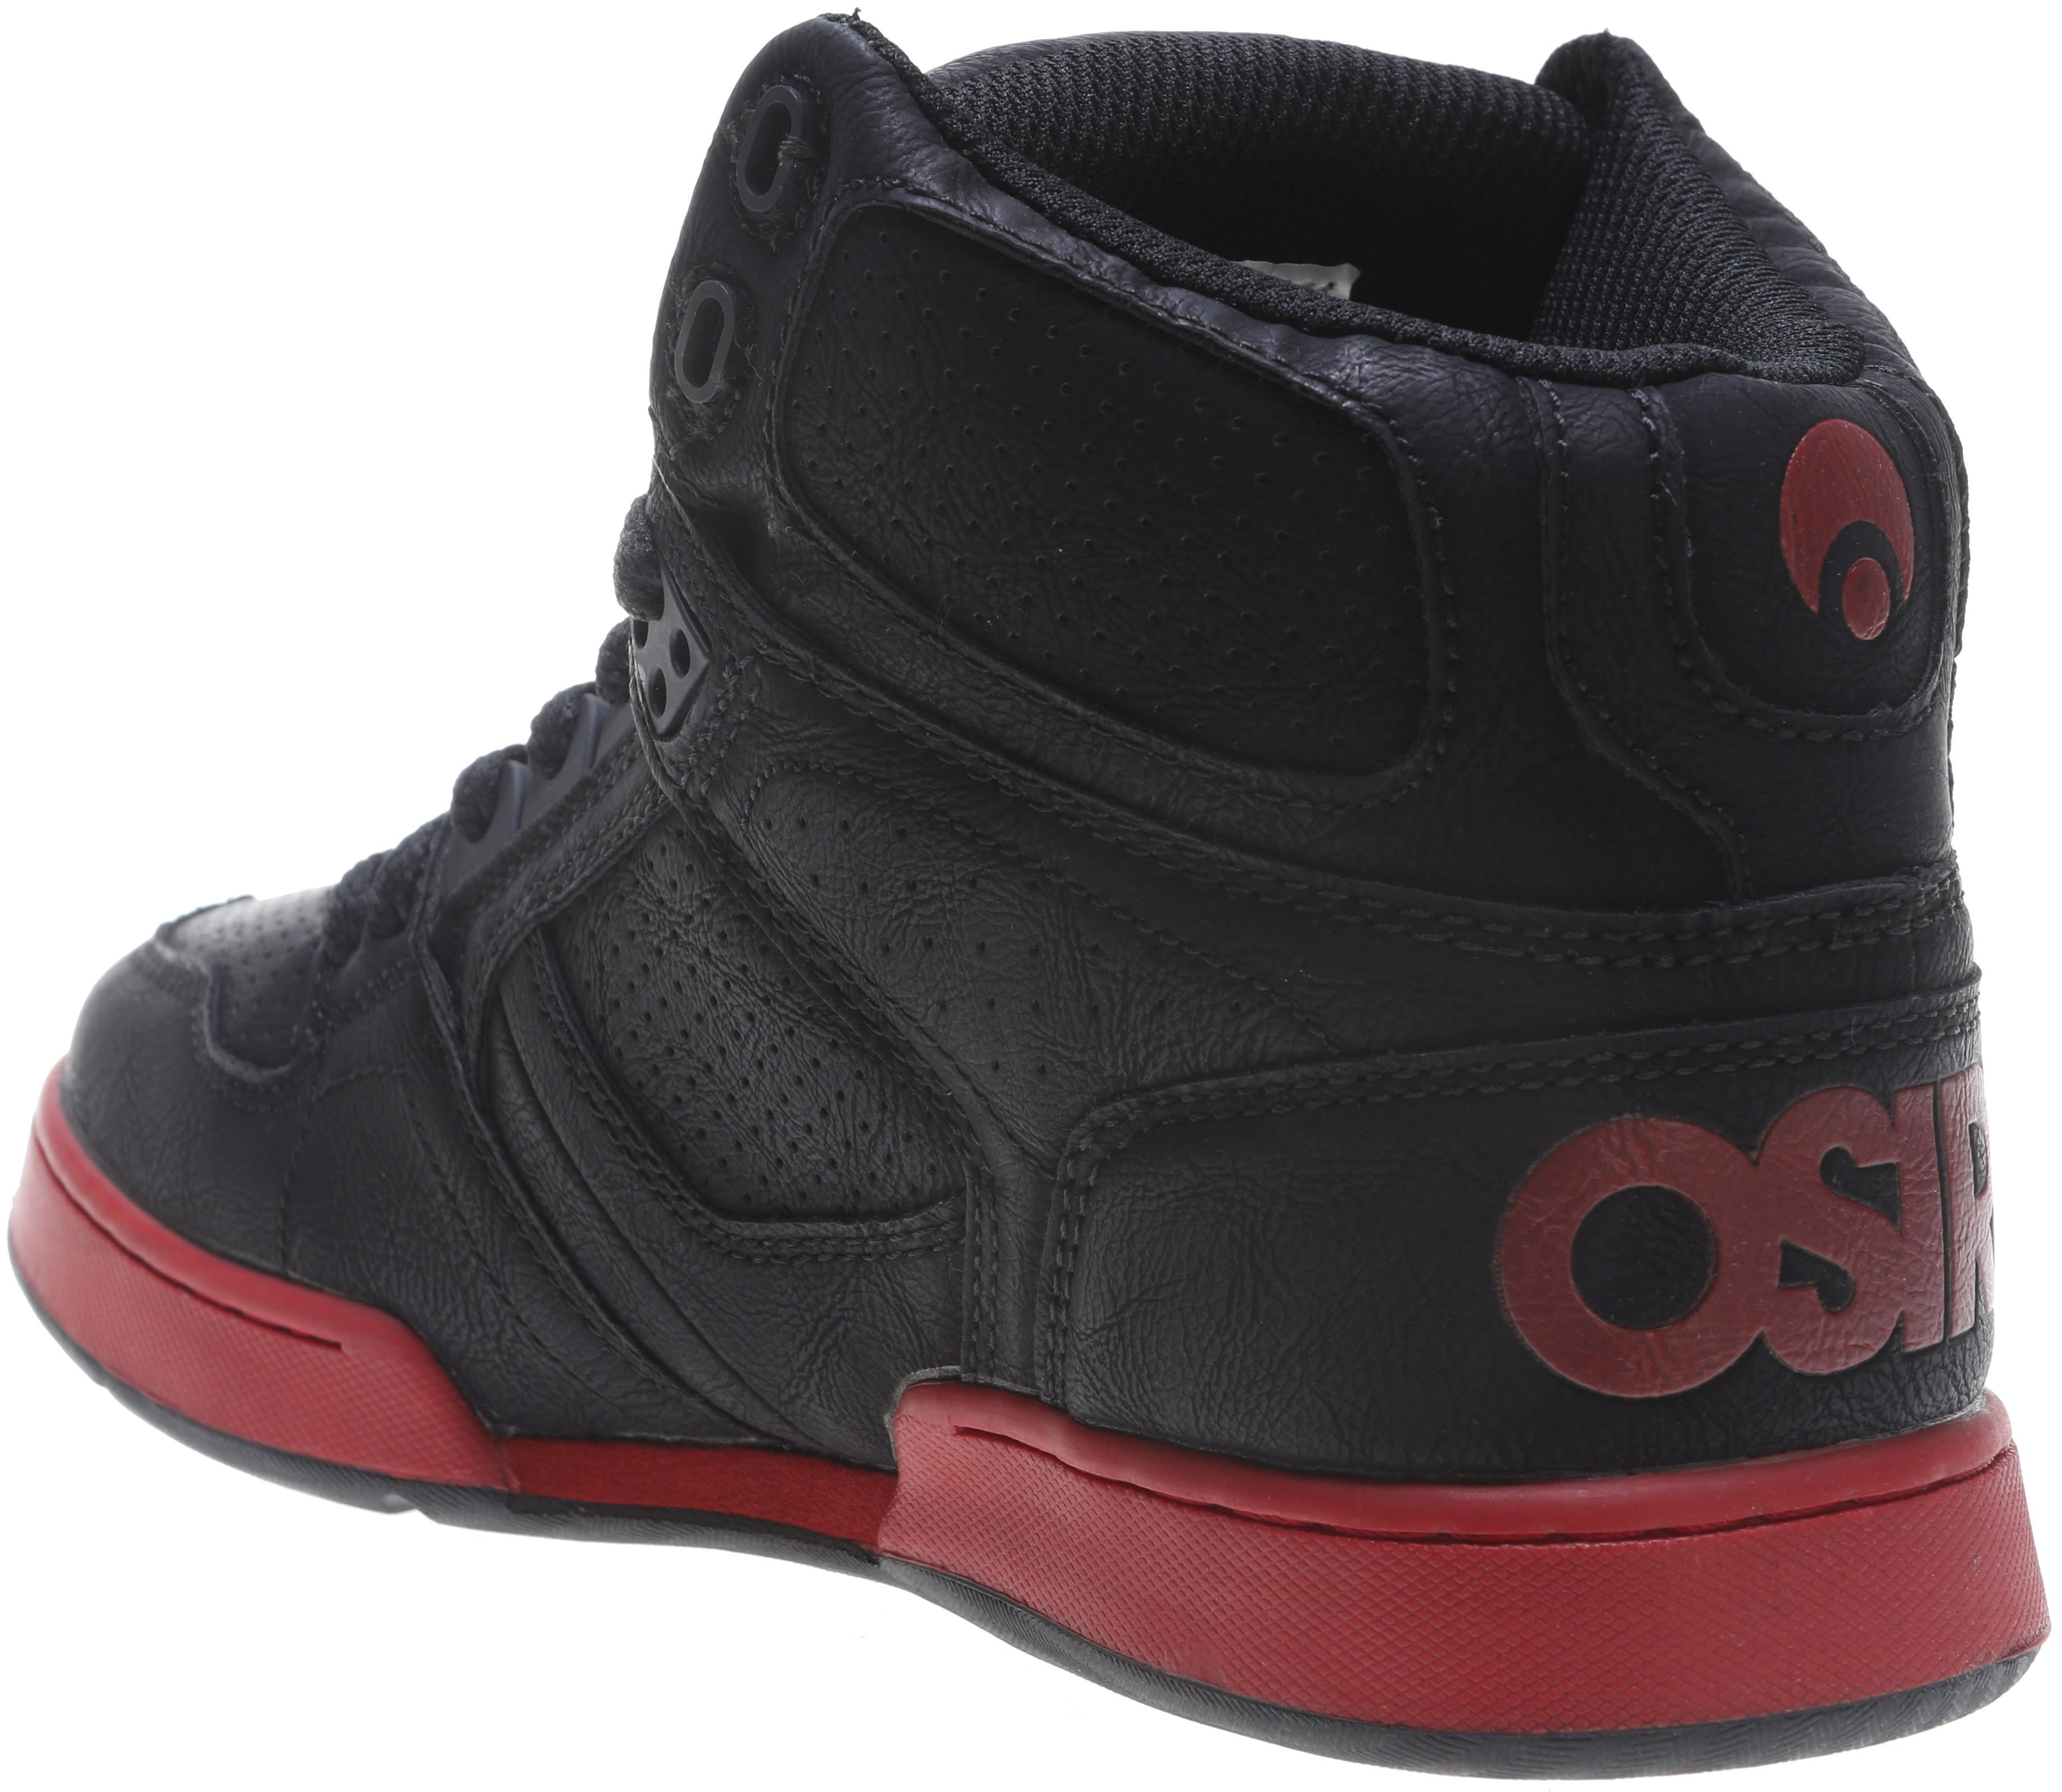 8e6e6374f9f Osiris NYC 83 Skate Shoes - thumbnail 3